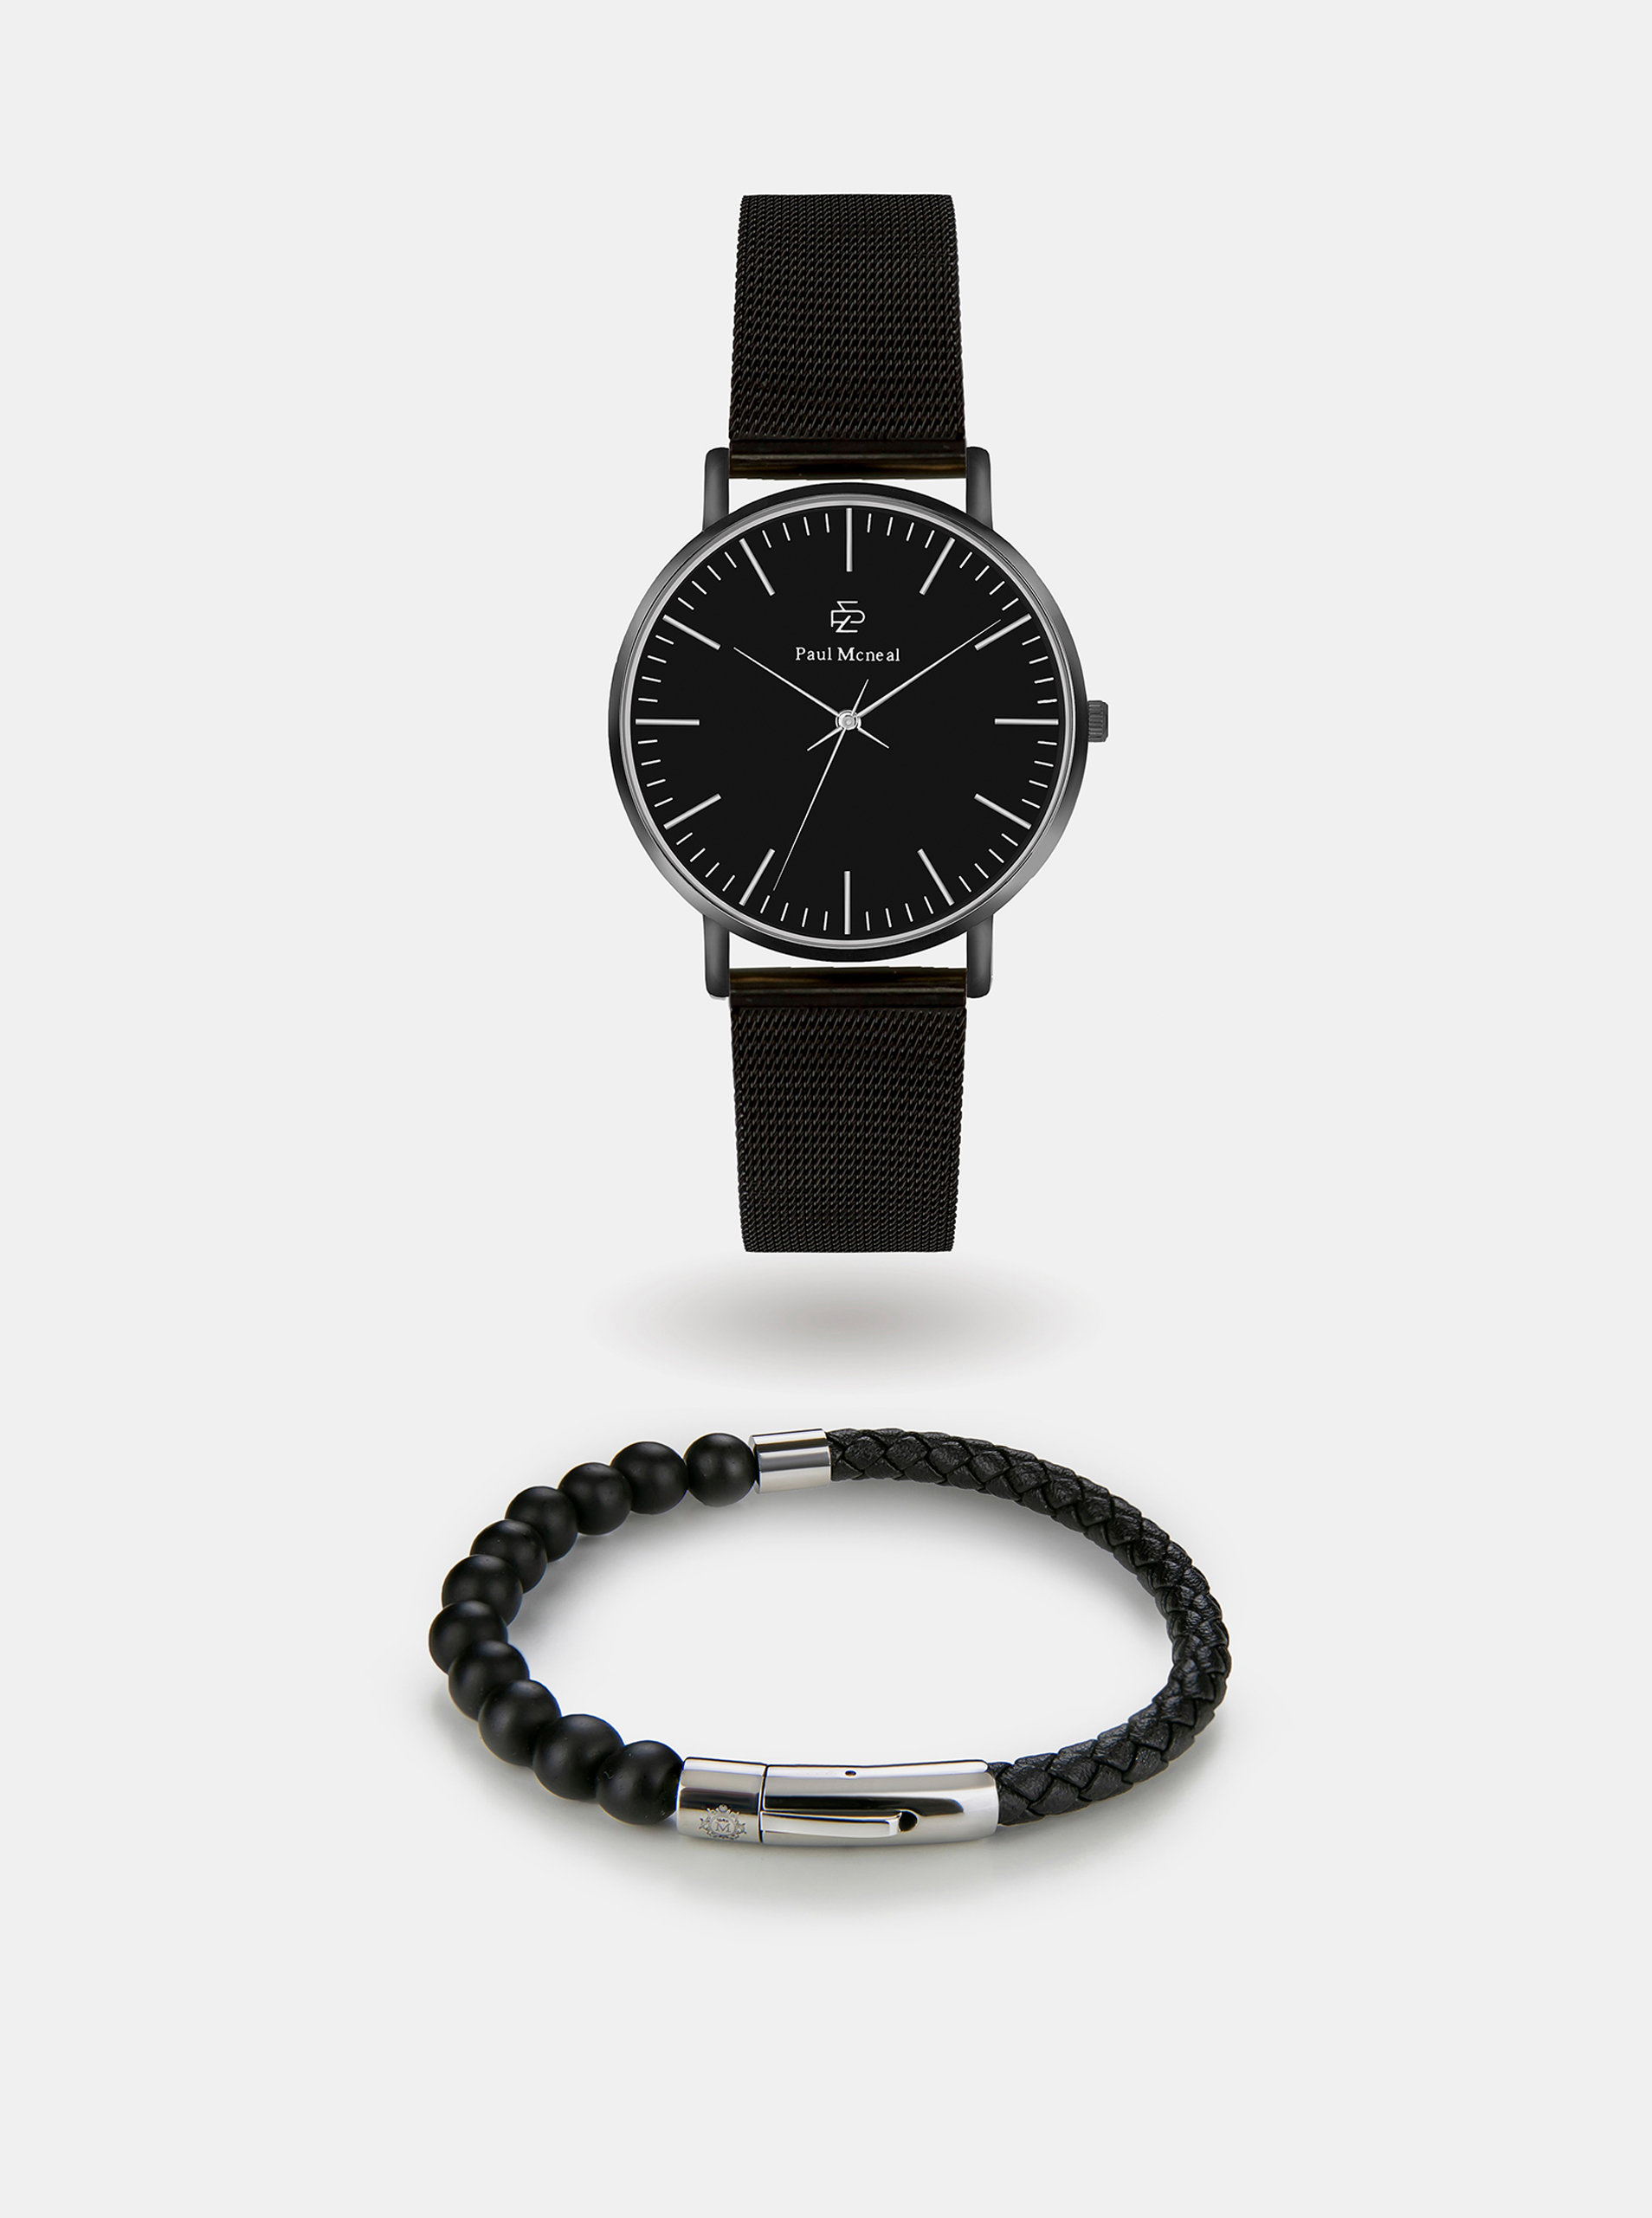 Sada pánských hodinek a náramku v černé barvě Paul McNeal